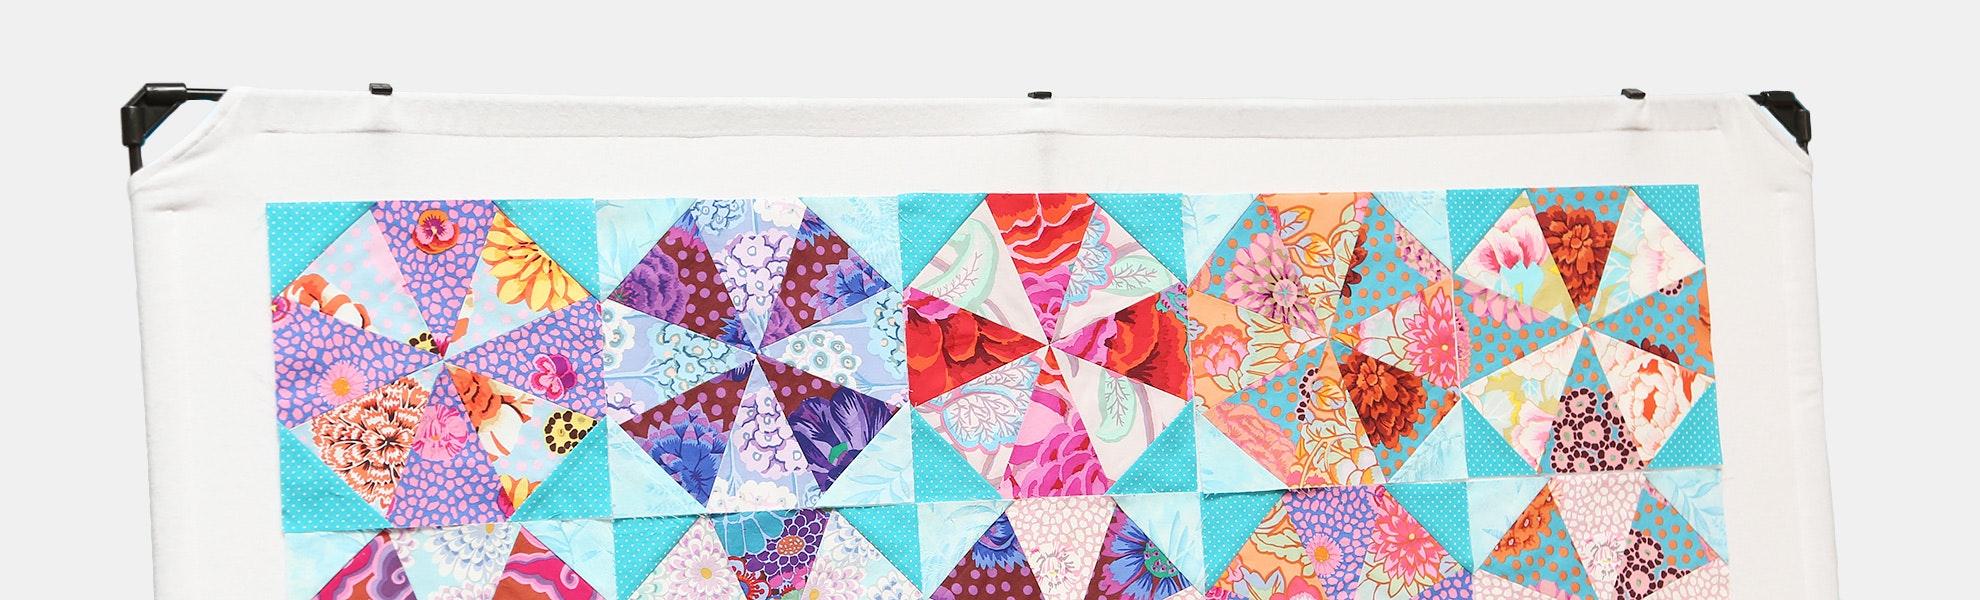 Cheryl Ann's Design Wall